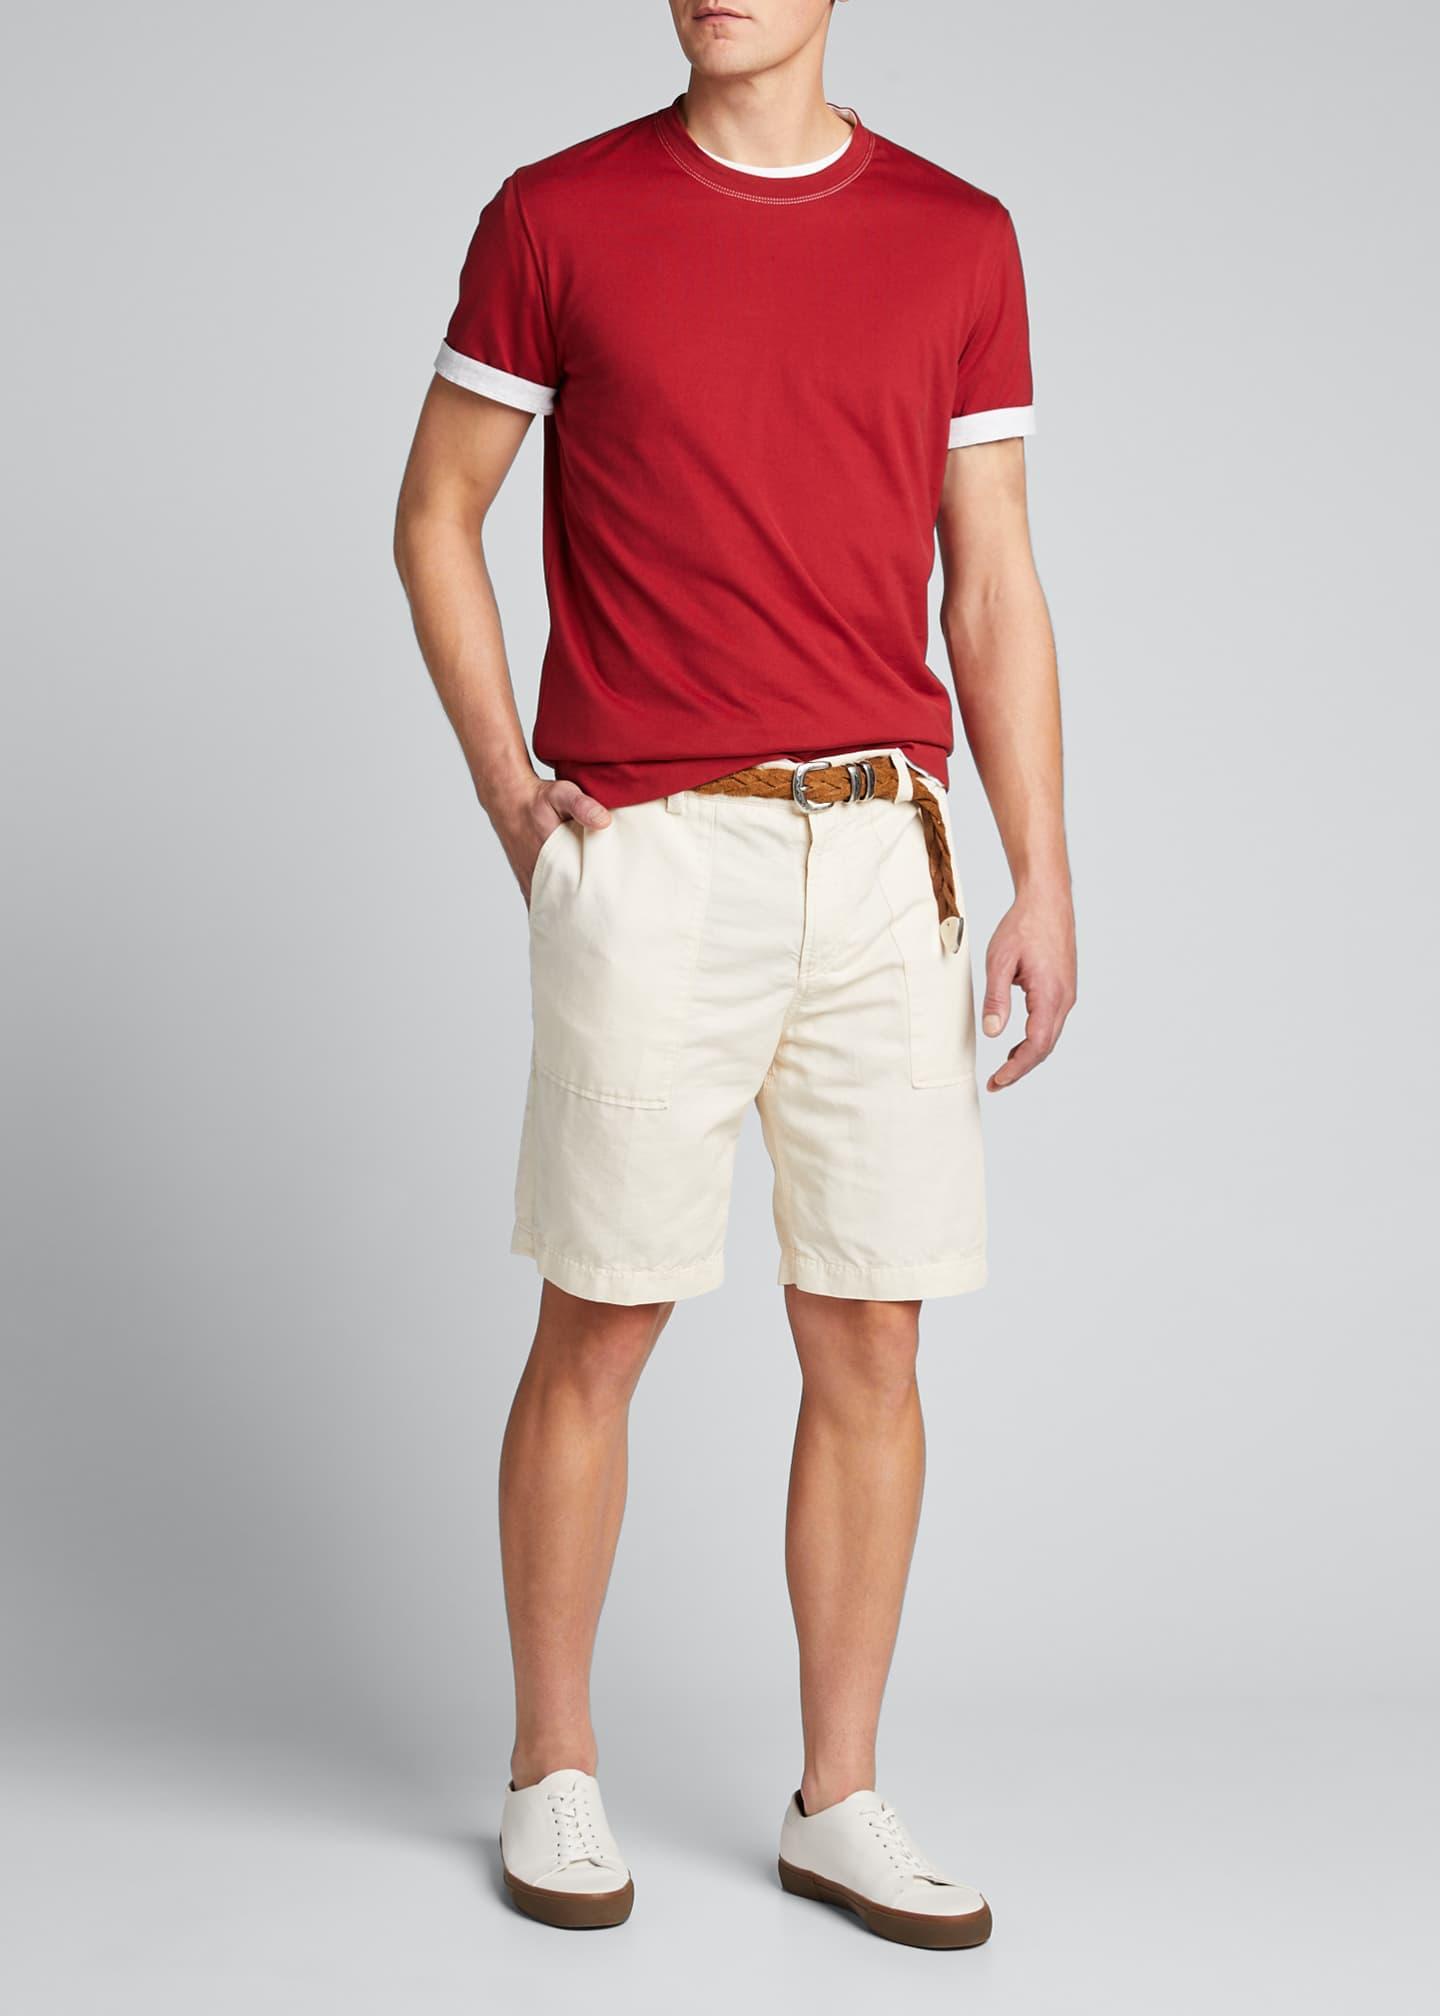 Brunello Cucinelli Men's Solid Jersey T-Shirt w/ Contrast